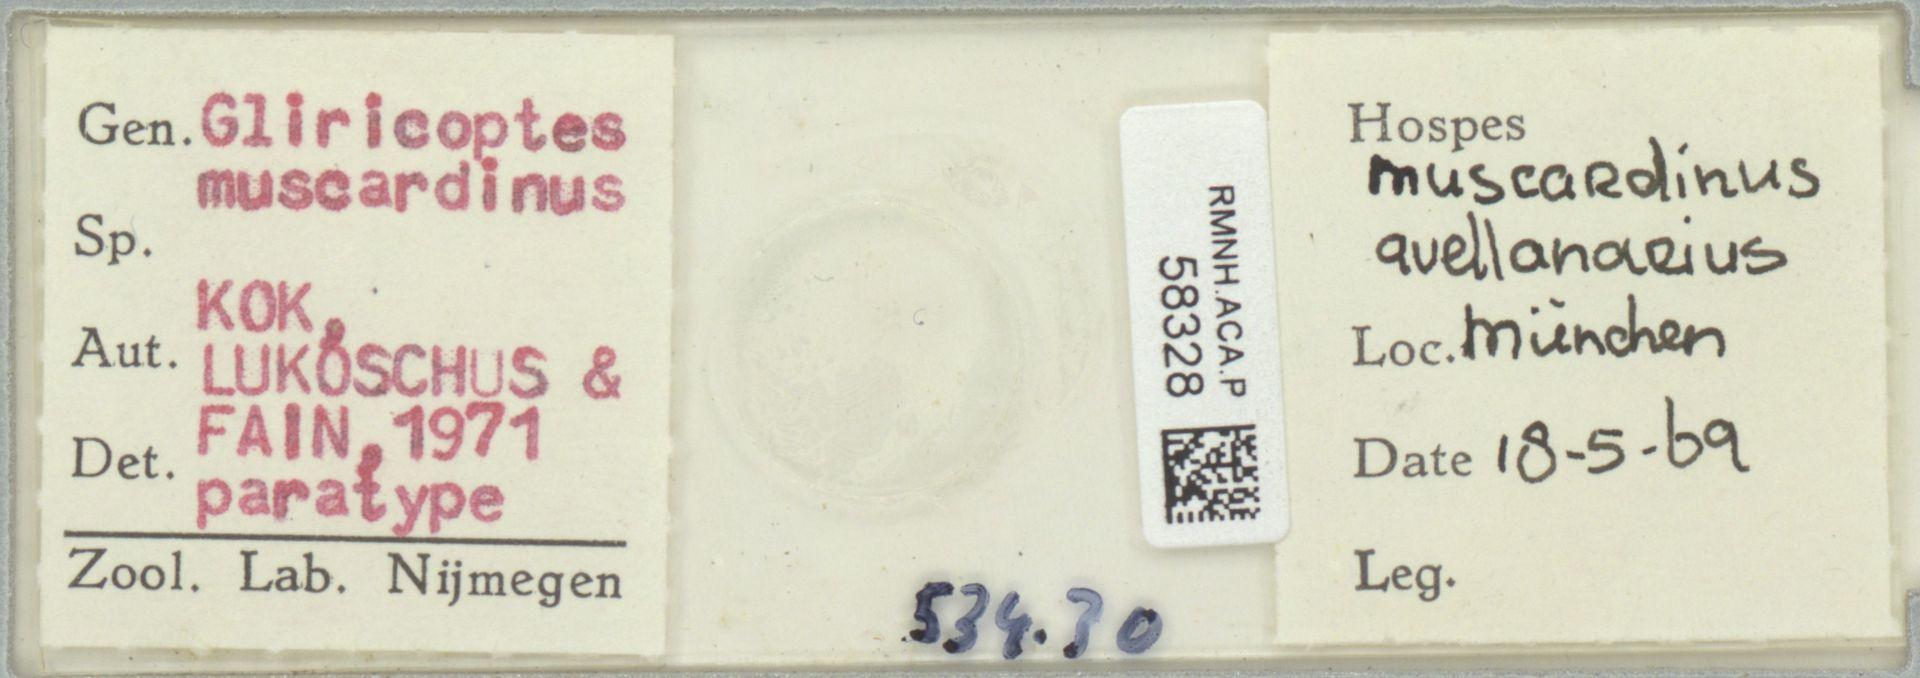 RMNH.ACA.P.58328 | Gliricoptes muscardinus Kok, Lukoschus & Fain. 1971